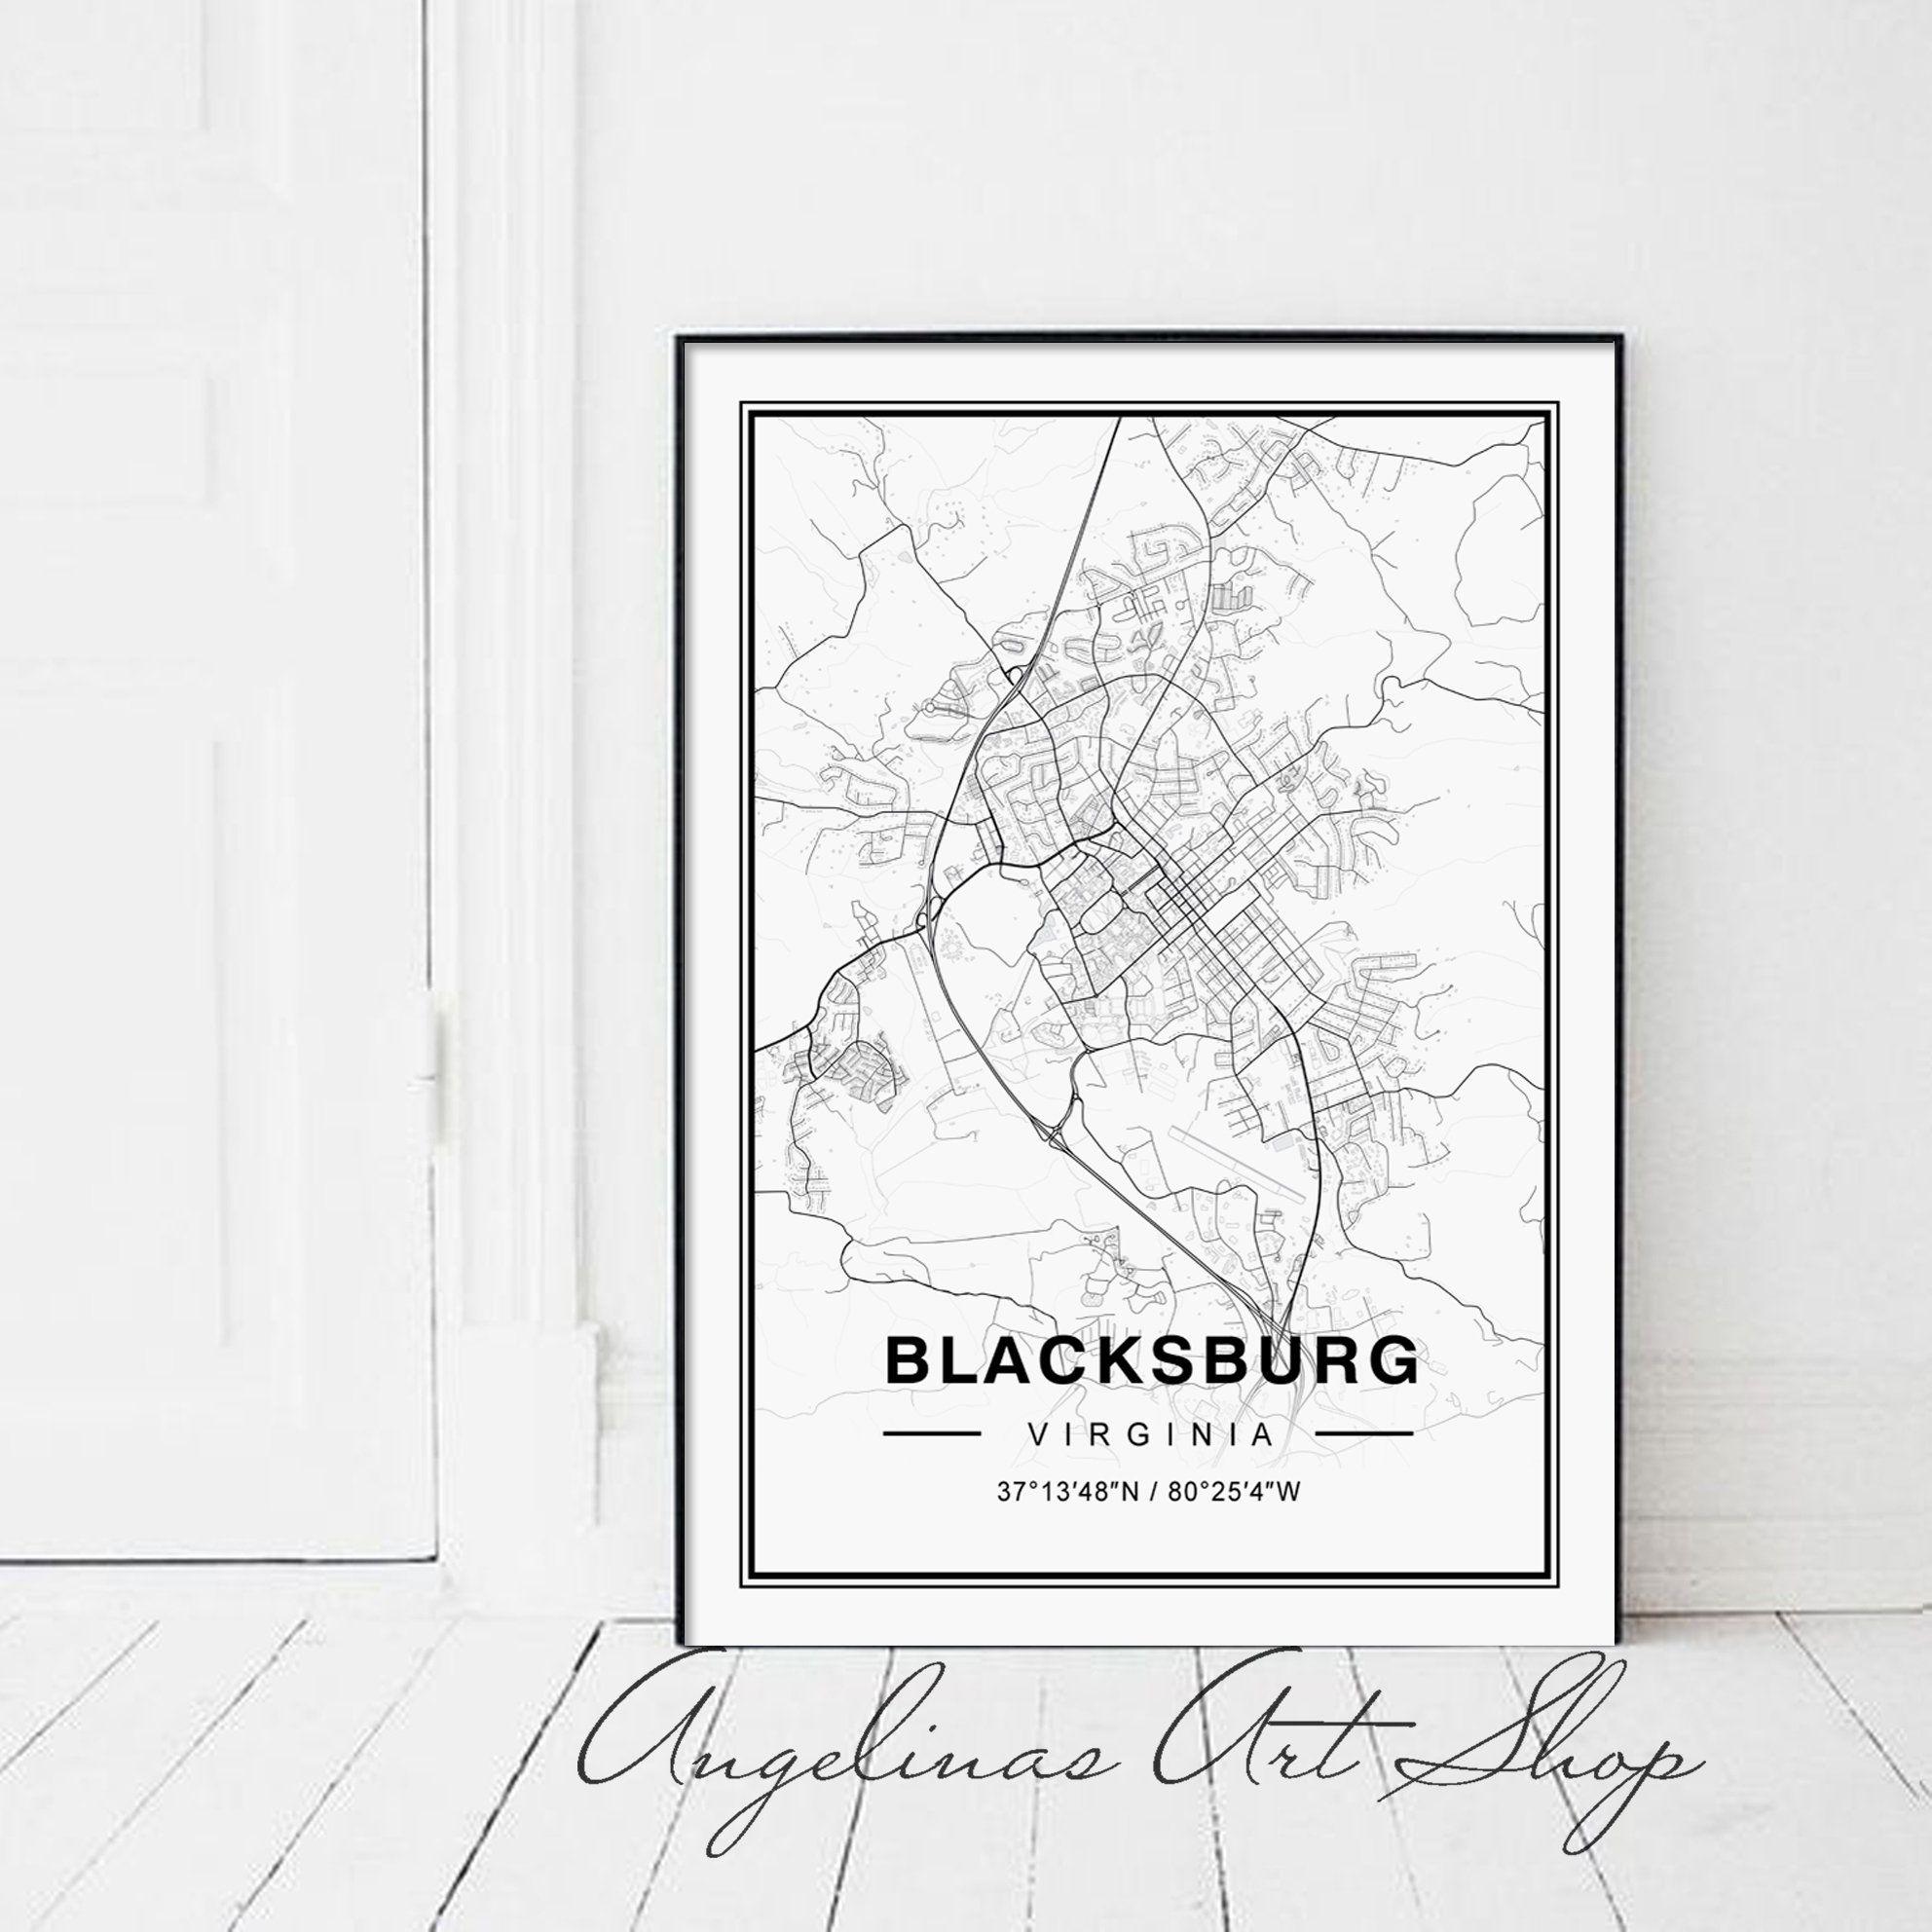 Blacksburg Poster Blacksburg Map Poster Blacksburg Virginia Map Blacksburg Map Print Blacksburg City Map Blacksburg Map